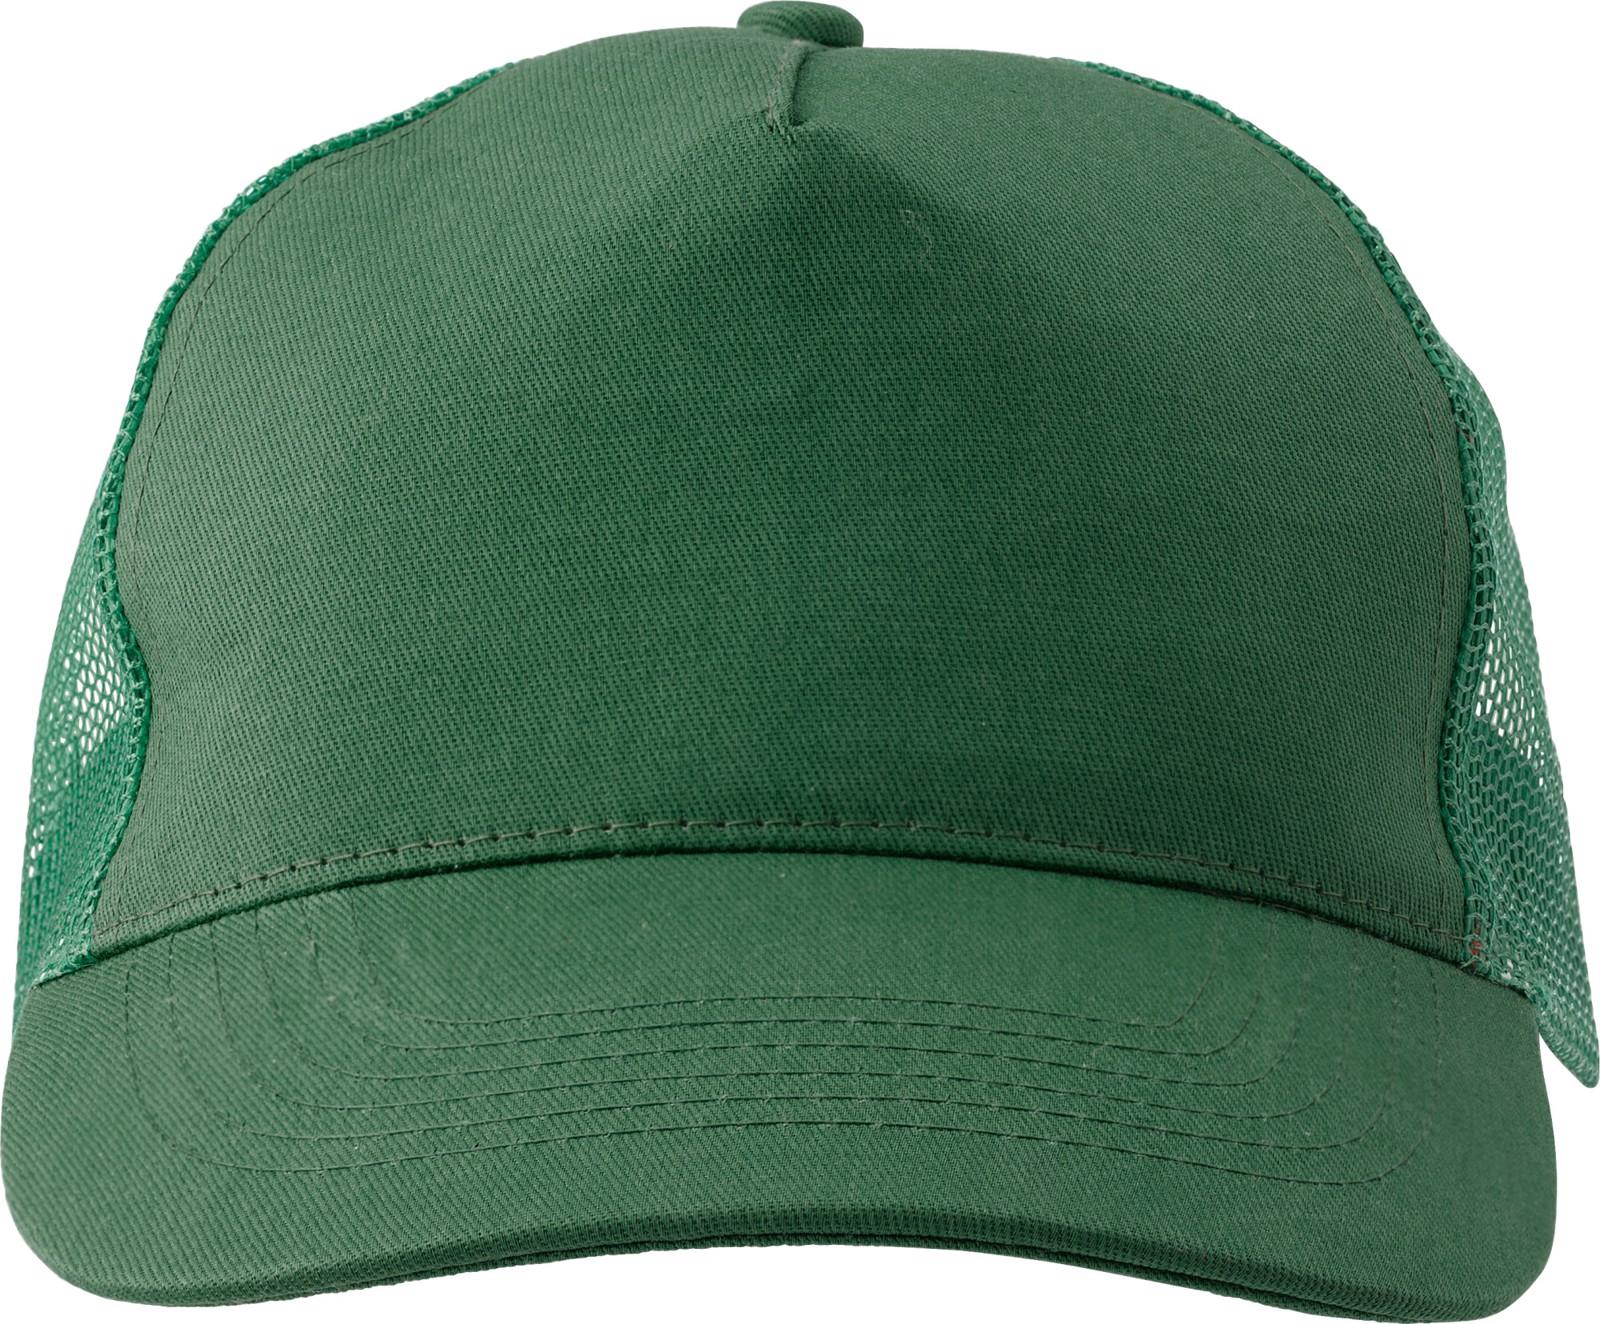 Cotton twill and plastic cap - Green